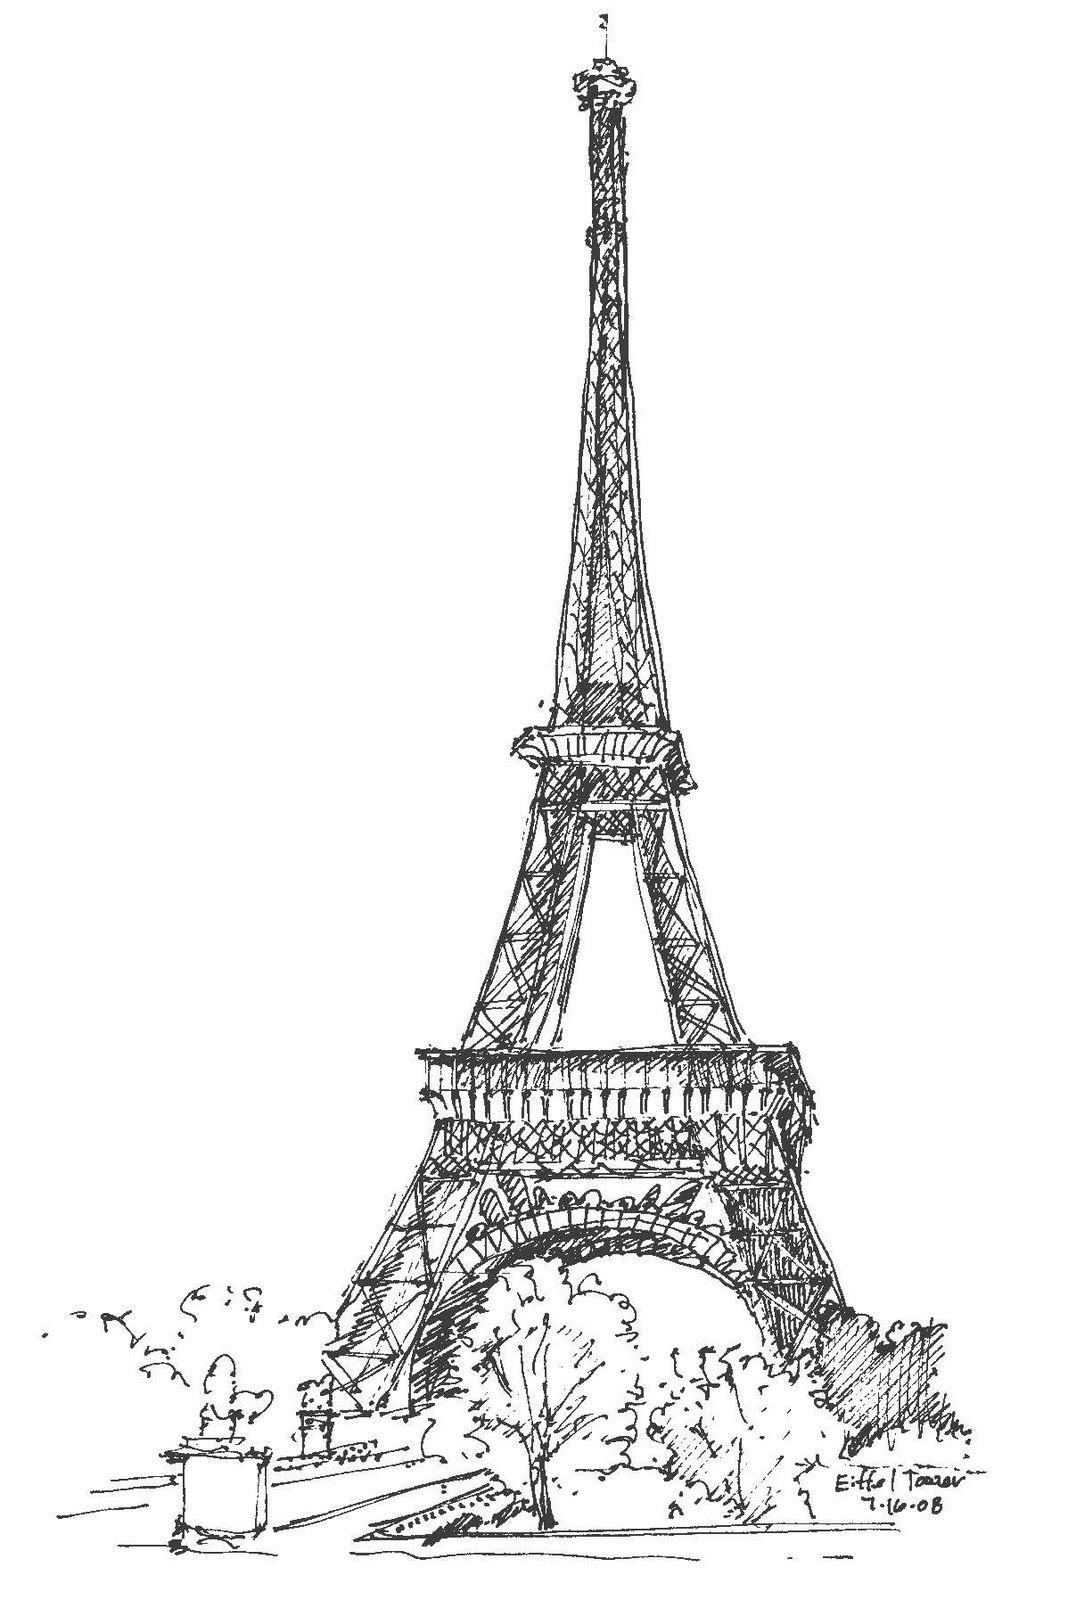 соорудить эйфелева башня картинки нарисованы карандашом чадо будет